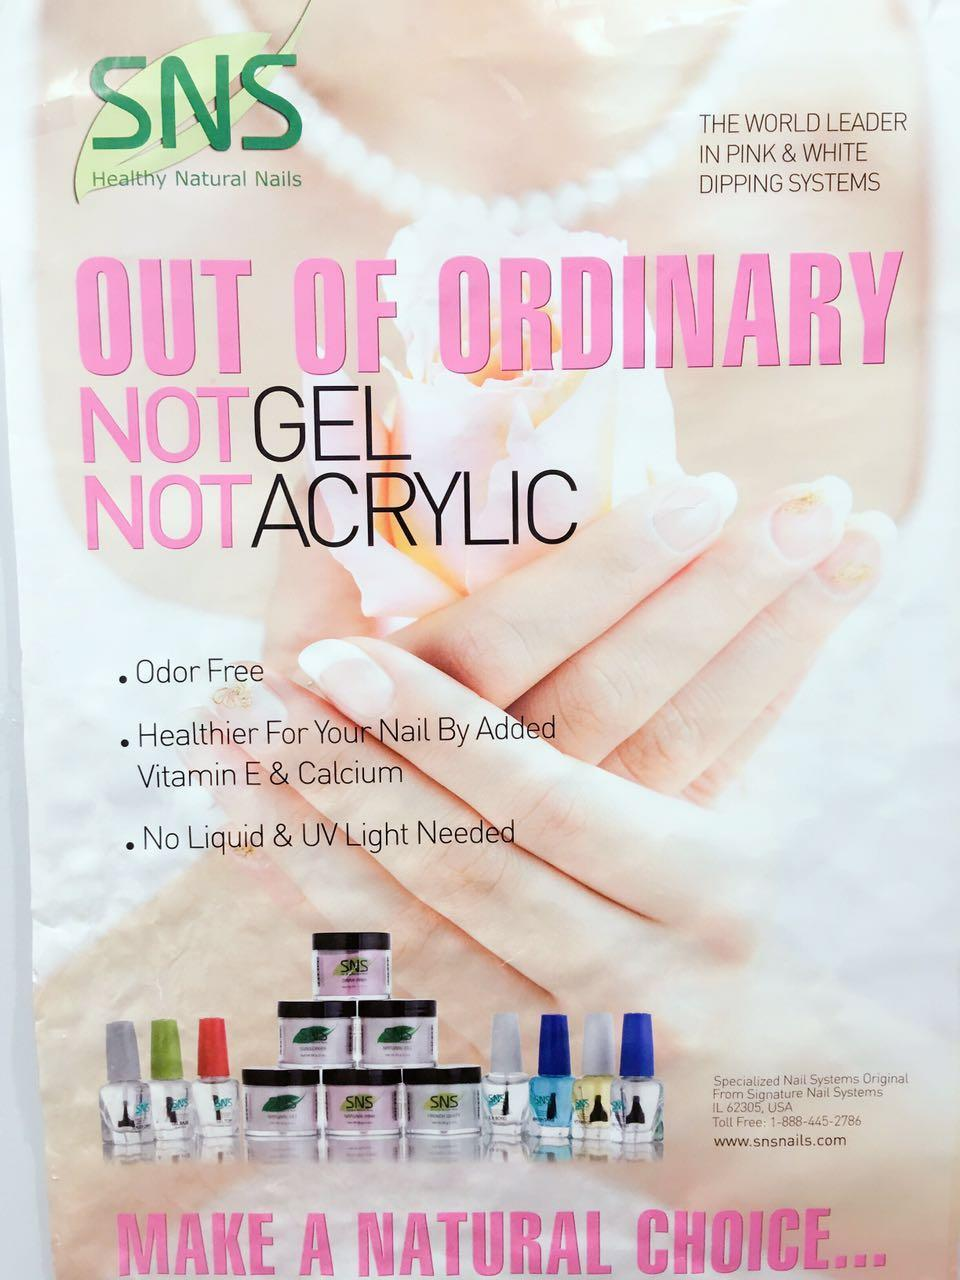 Bloom nails spa chelsea nail salon in new york ny for Acrylic nail salon nyc